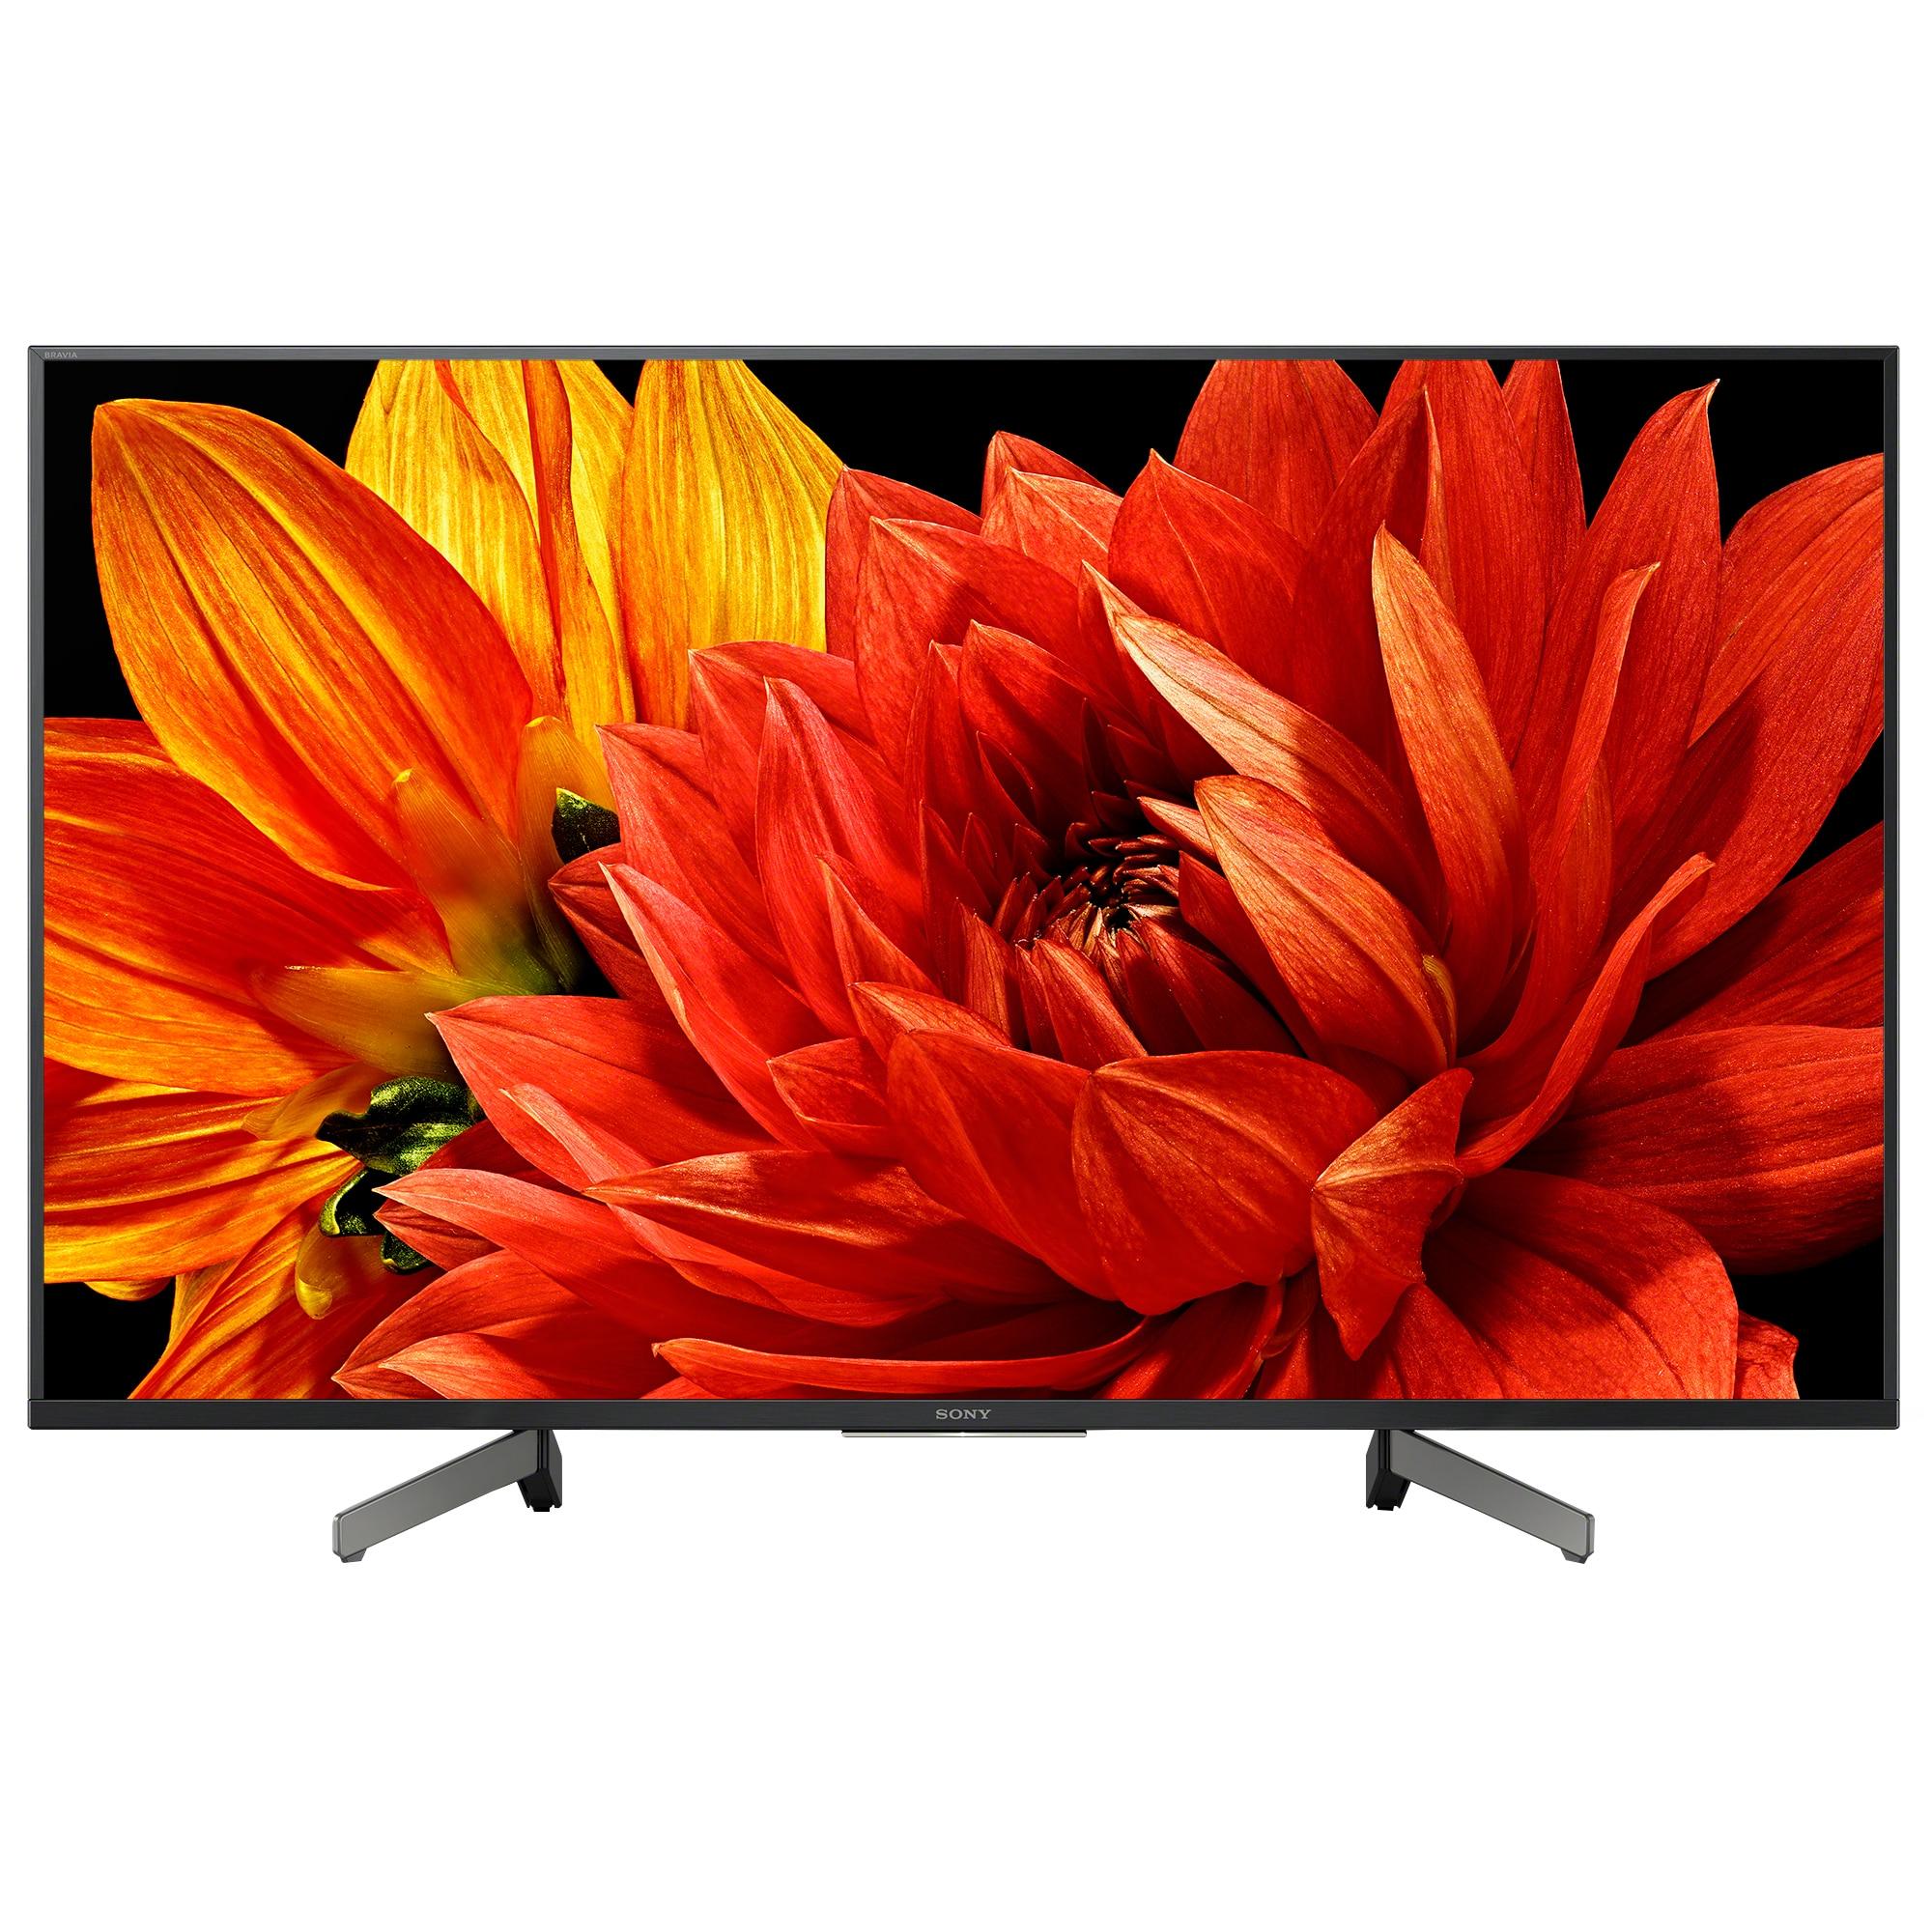 Fotografie Televizor Smart Android LED Sony BRAVIA, 123.2 cm, 49XG8396, 4K Ultra HD, Clasa A